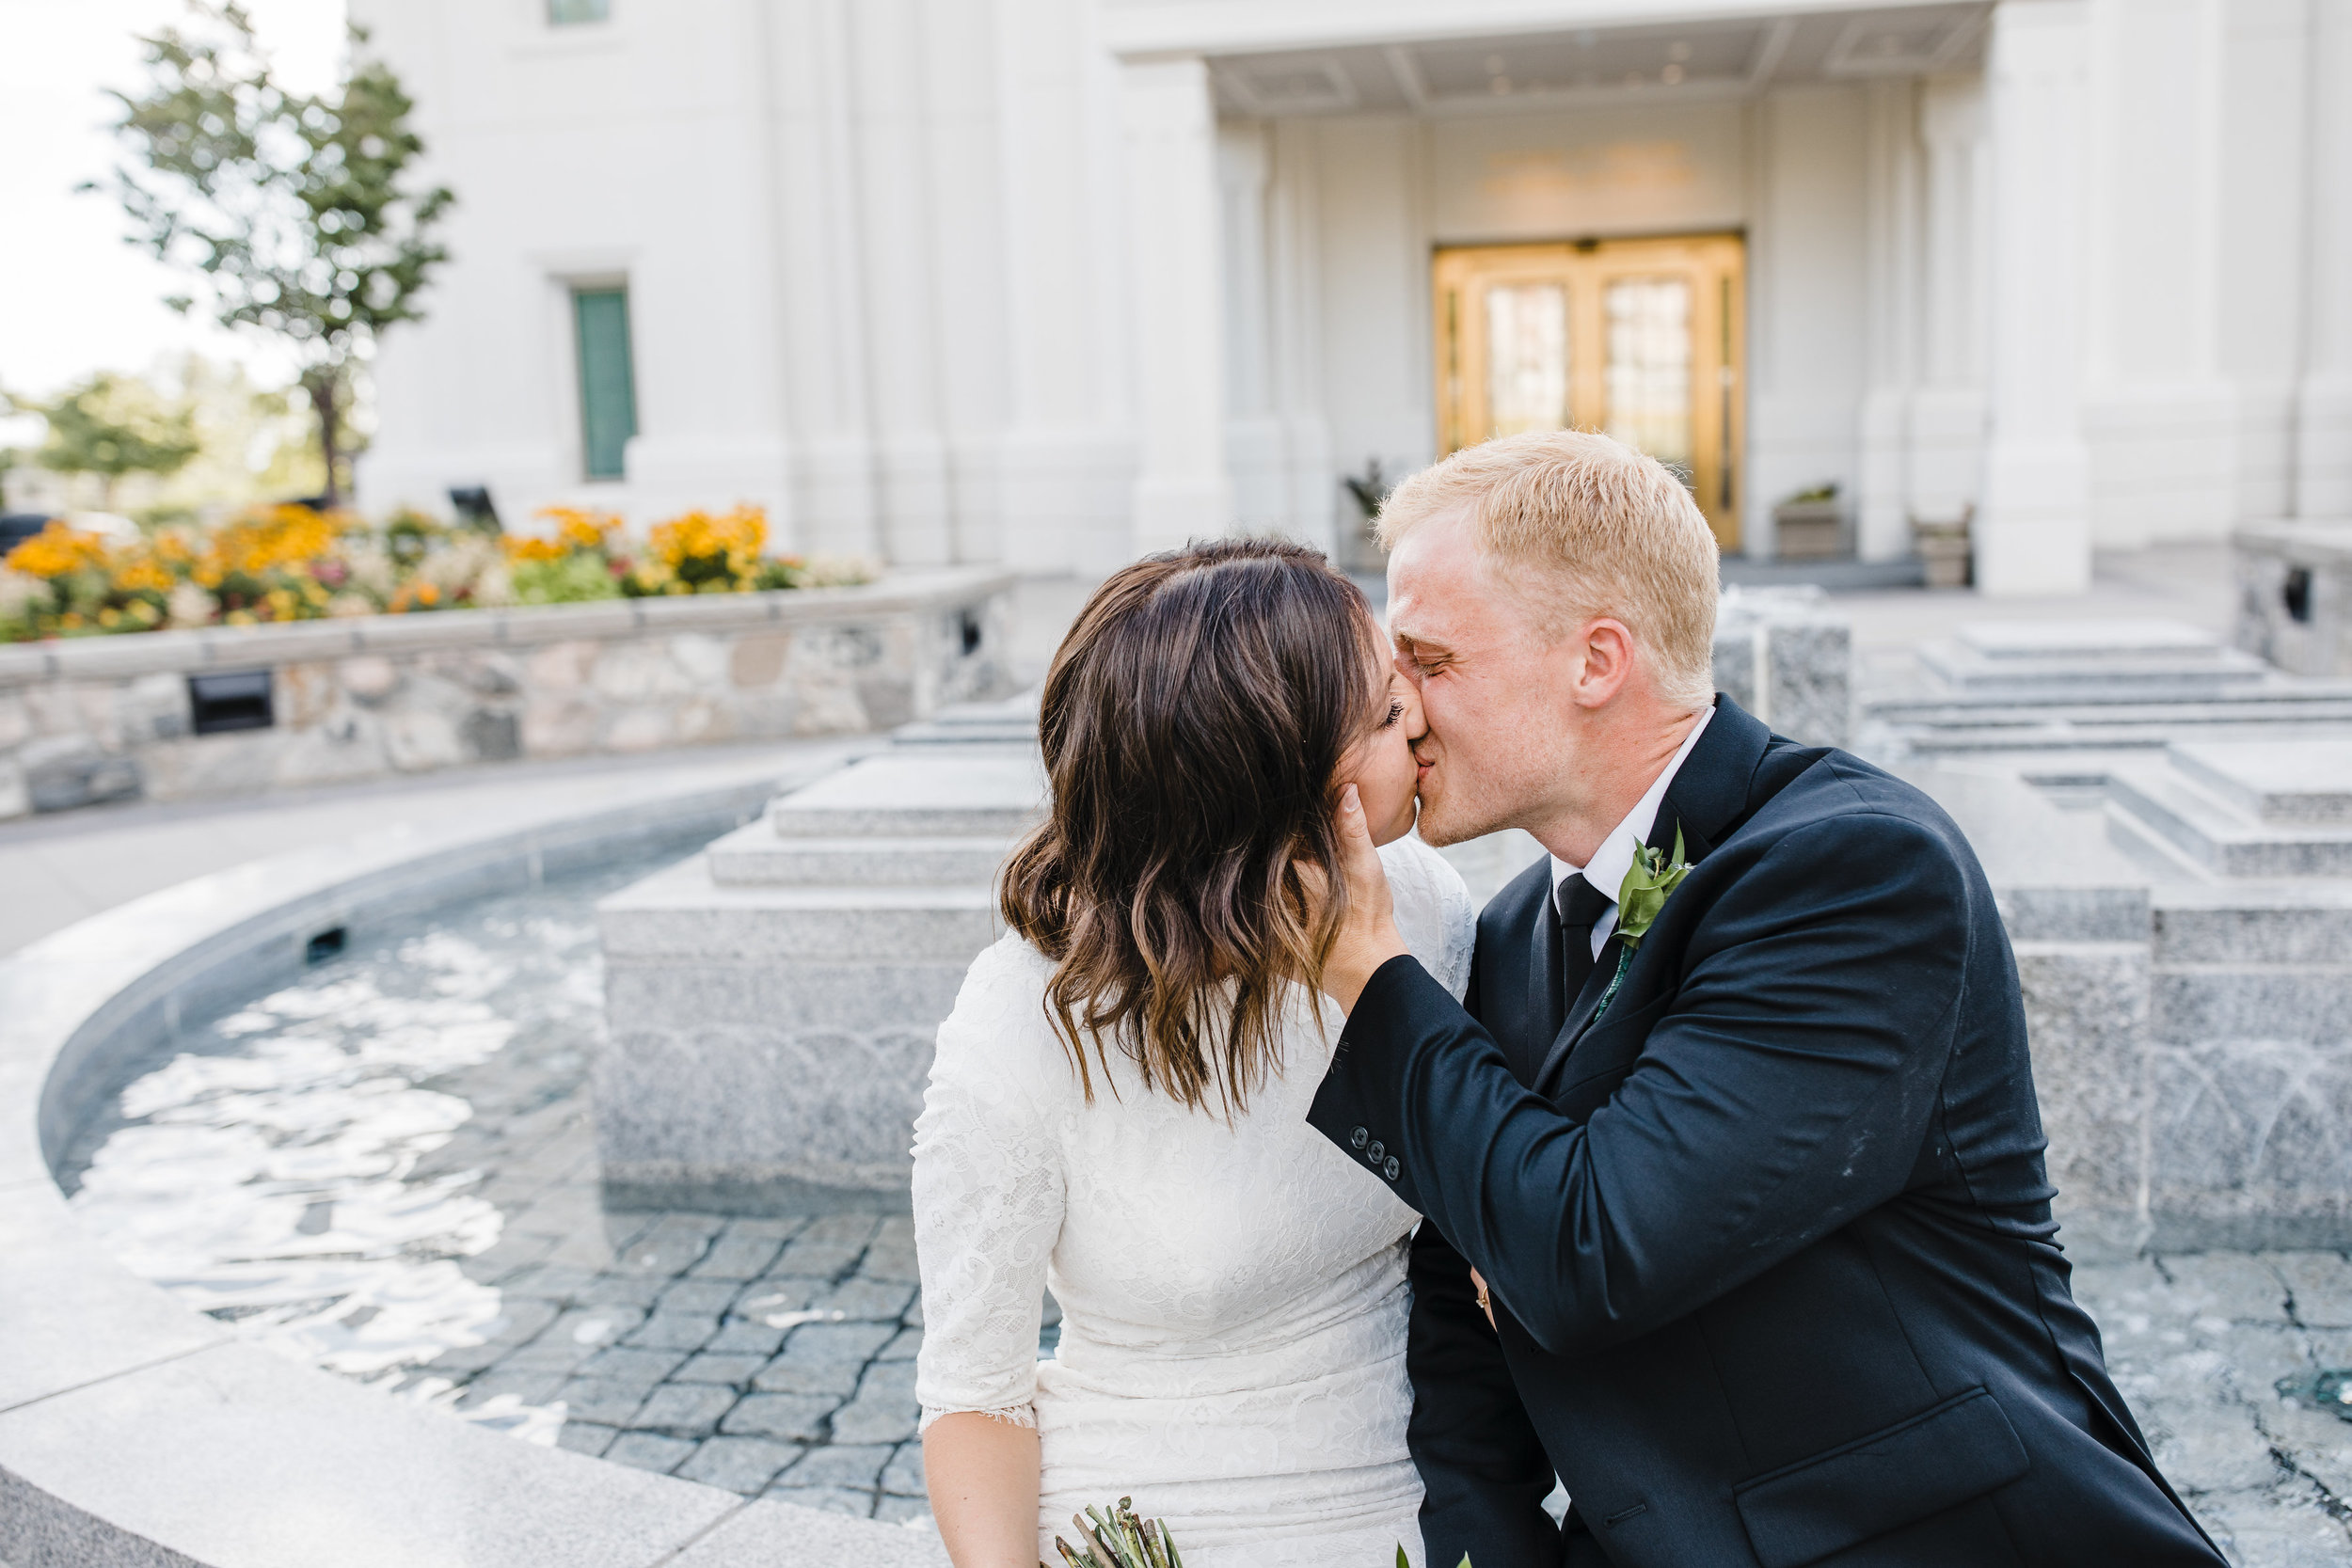 professional wedding photographer in brigham city utah kissing lds happy romantic bridals